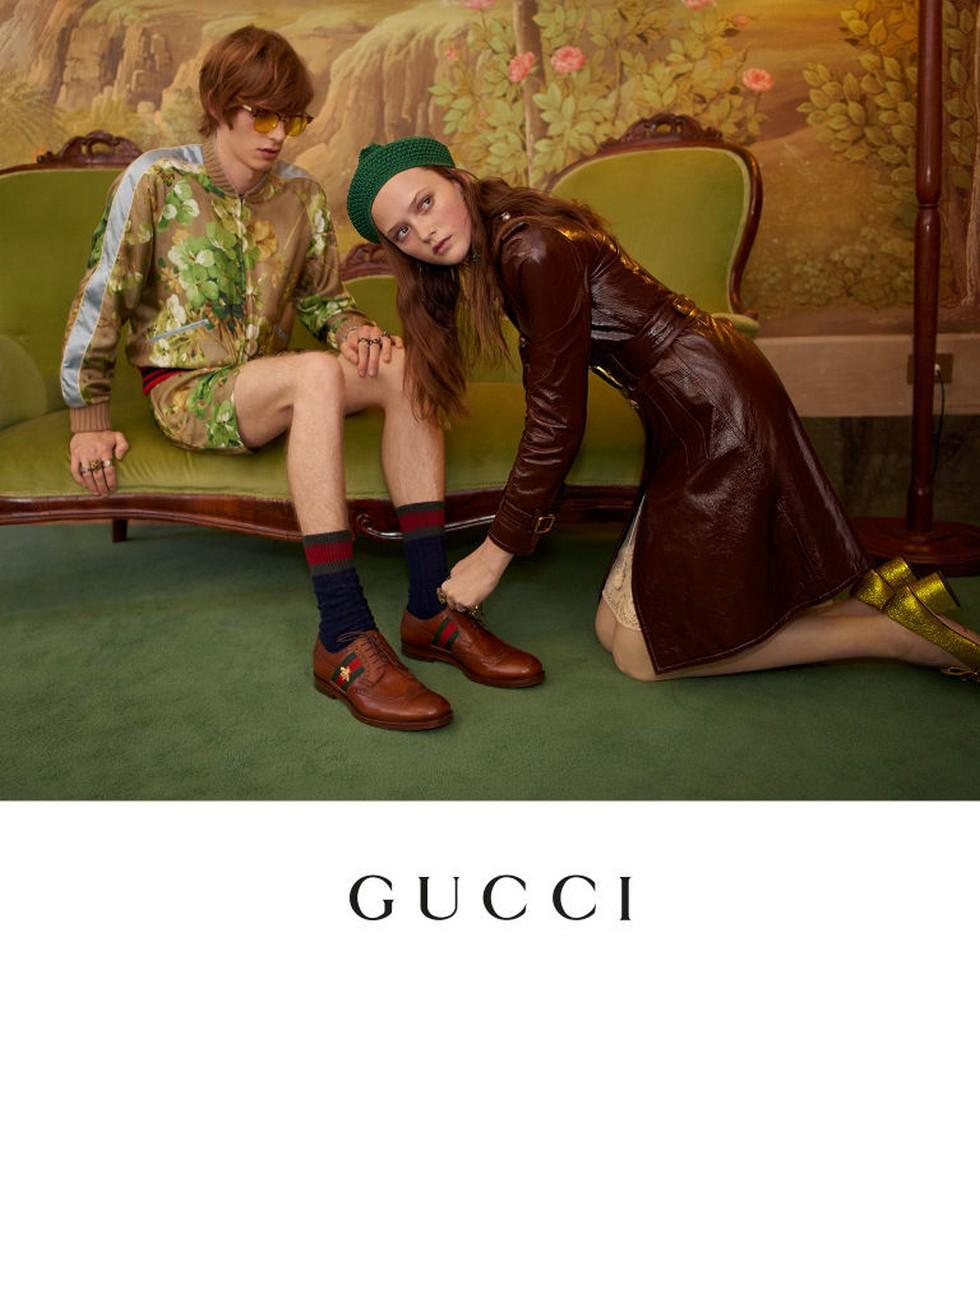 Milan Fashion Boutiques Gucci unveils new store concept (6) Milan Fashion Boutiques: Gucci unveils new store concept Milan Fashion Boutiques: Gucci unveils new store concept Milan Fashion Boutiques Gucci unveils new store concept 6